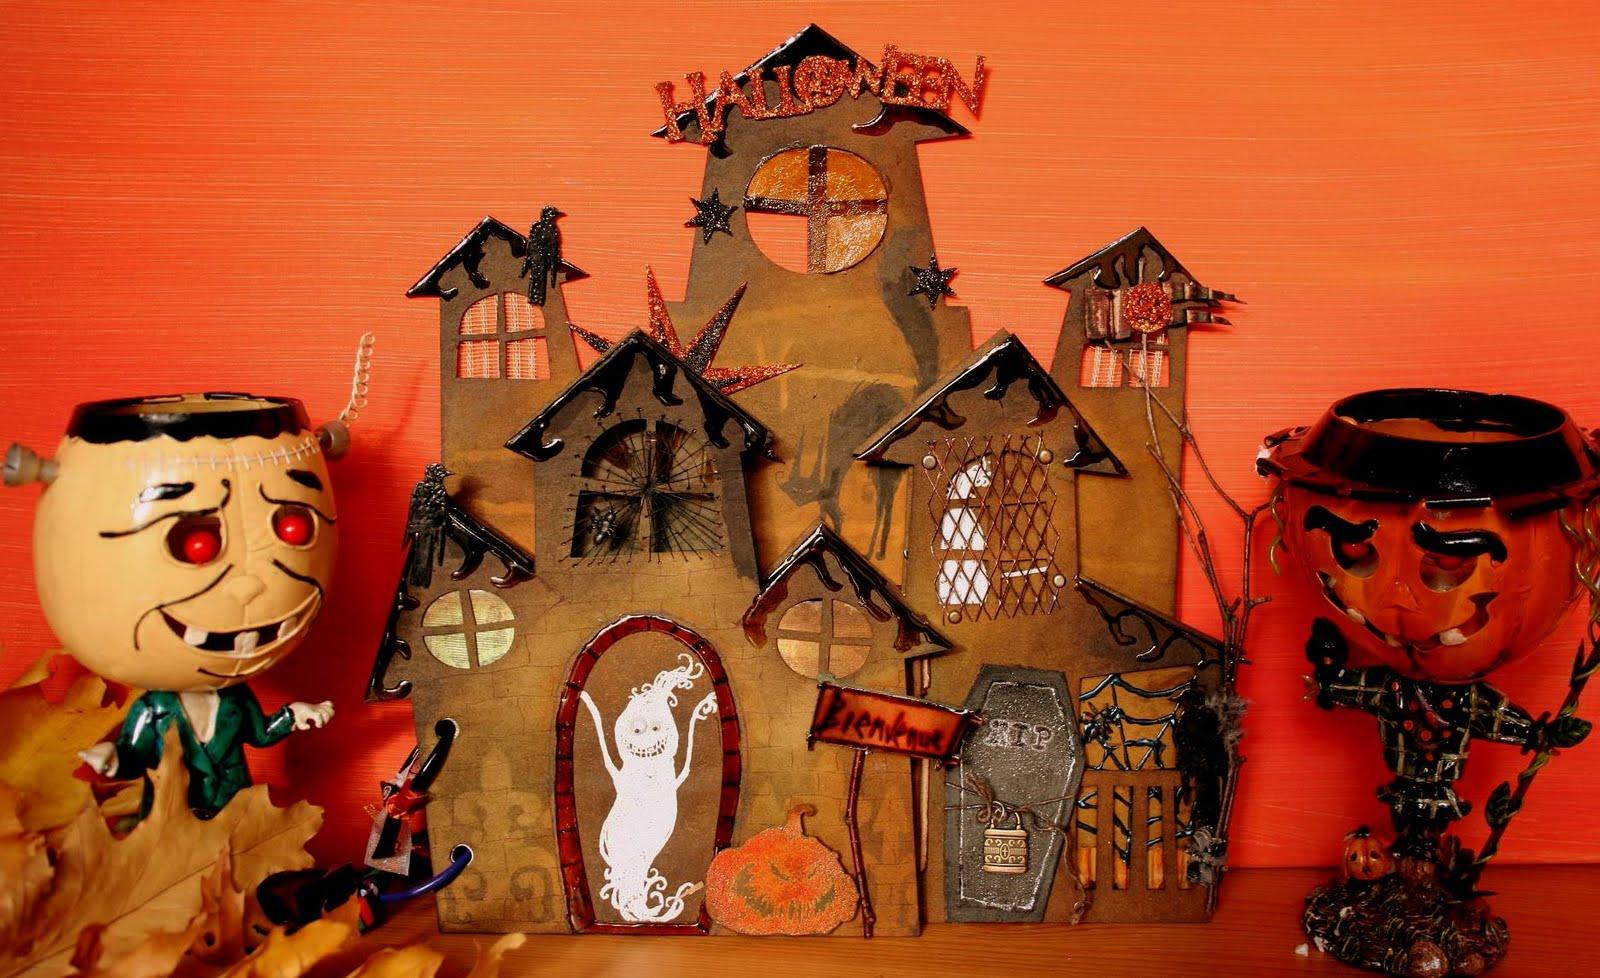 Magenta: Maison hantée / Haunted Mansion